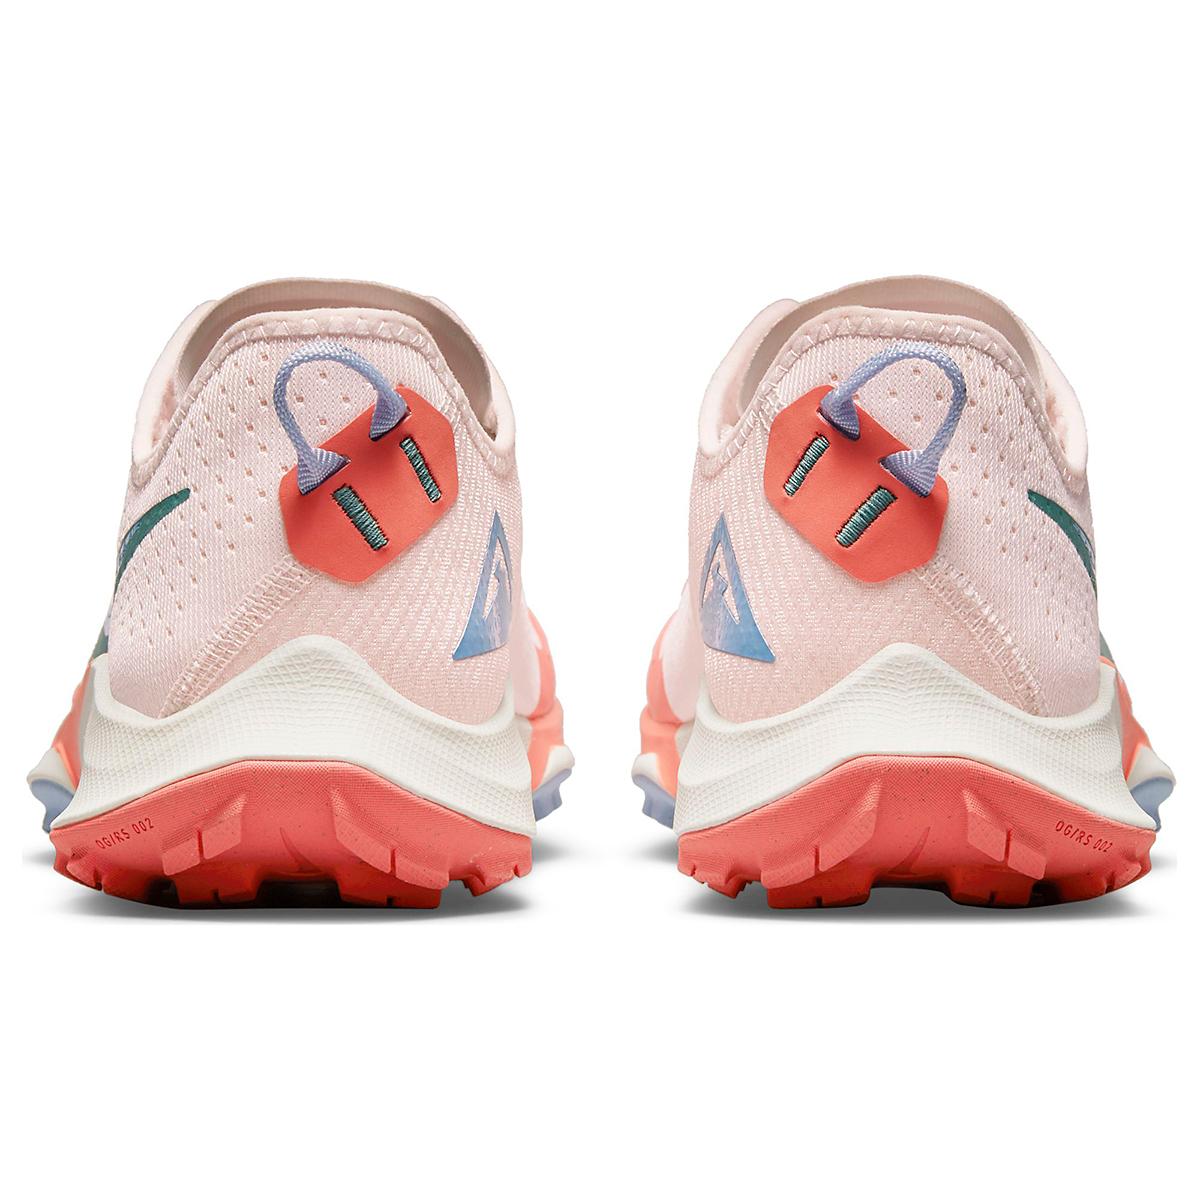 Women's Nike Air Zoom Terra Kiger 7 Trail Running Shoe - Color: Light Soft Pink/Bicoastal/Magic Ember - Size: 5 - Width: Regular, Light Soft Pink/Bicoastal/Magic Ember, large, image 7